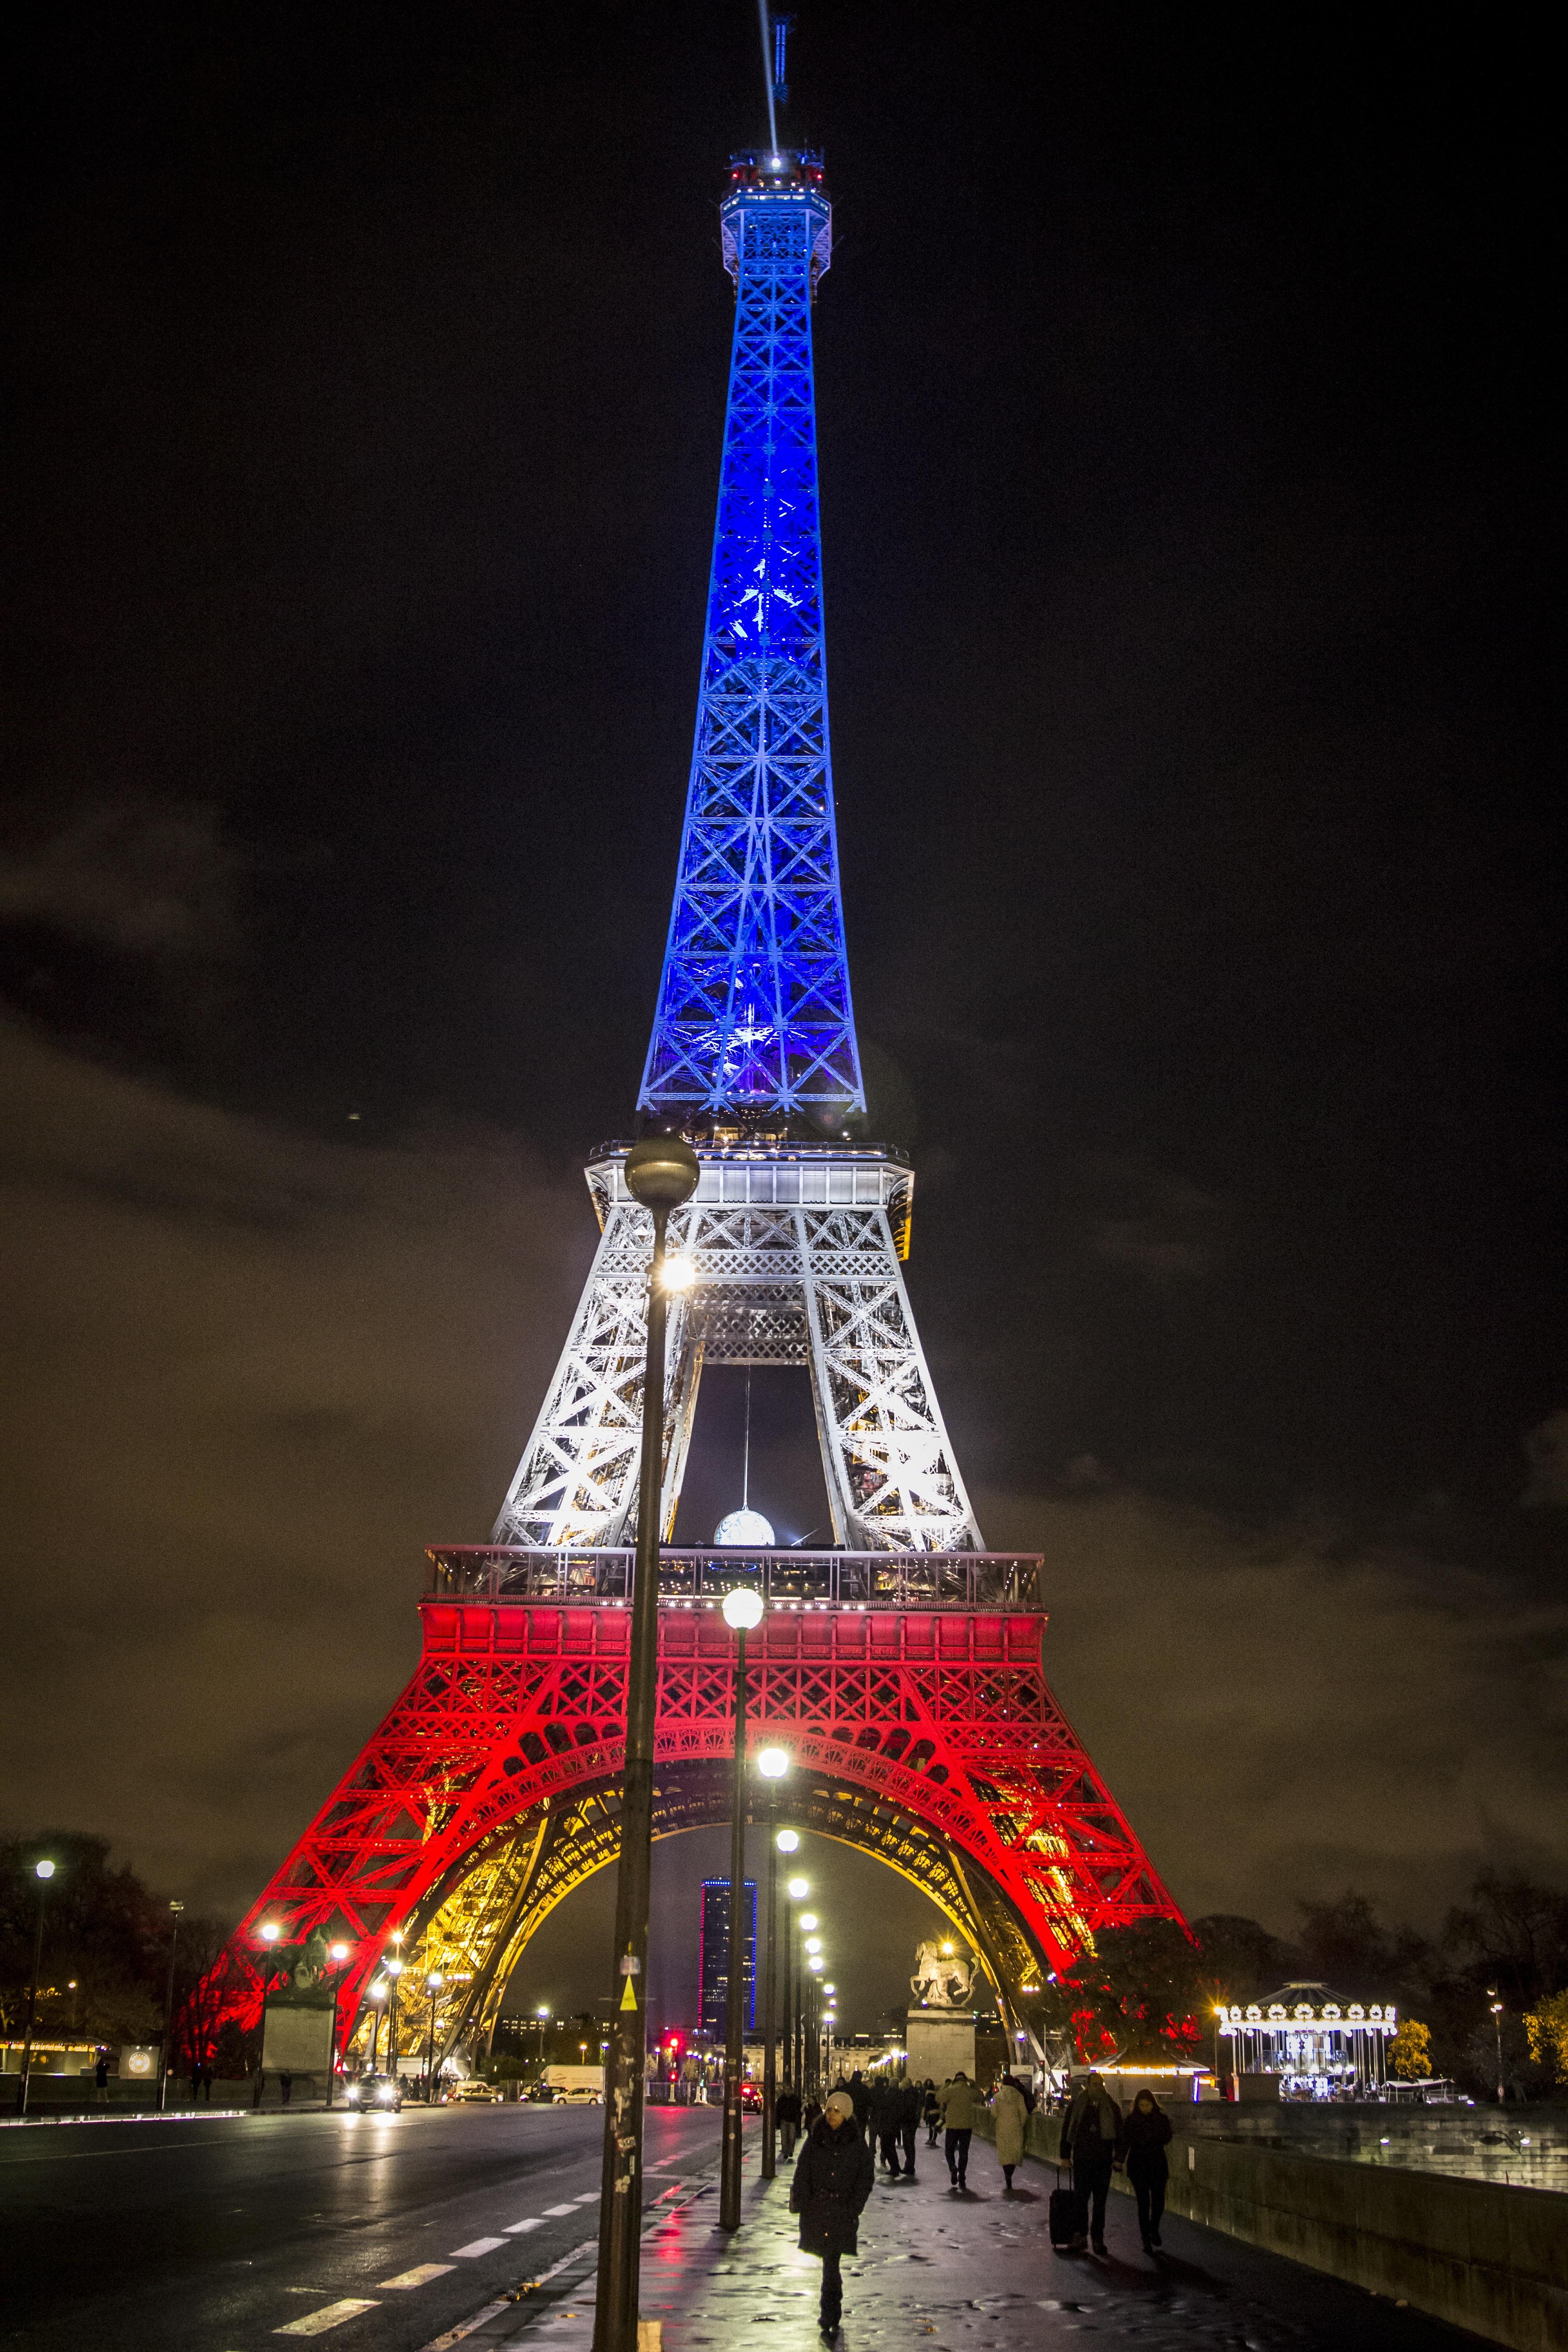 light night eiffel tower paris cityscape france europe evening tower flag landmark tourism lighting christmas tree